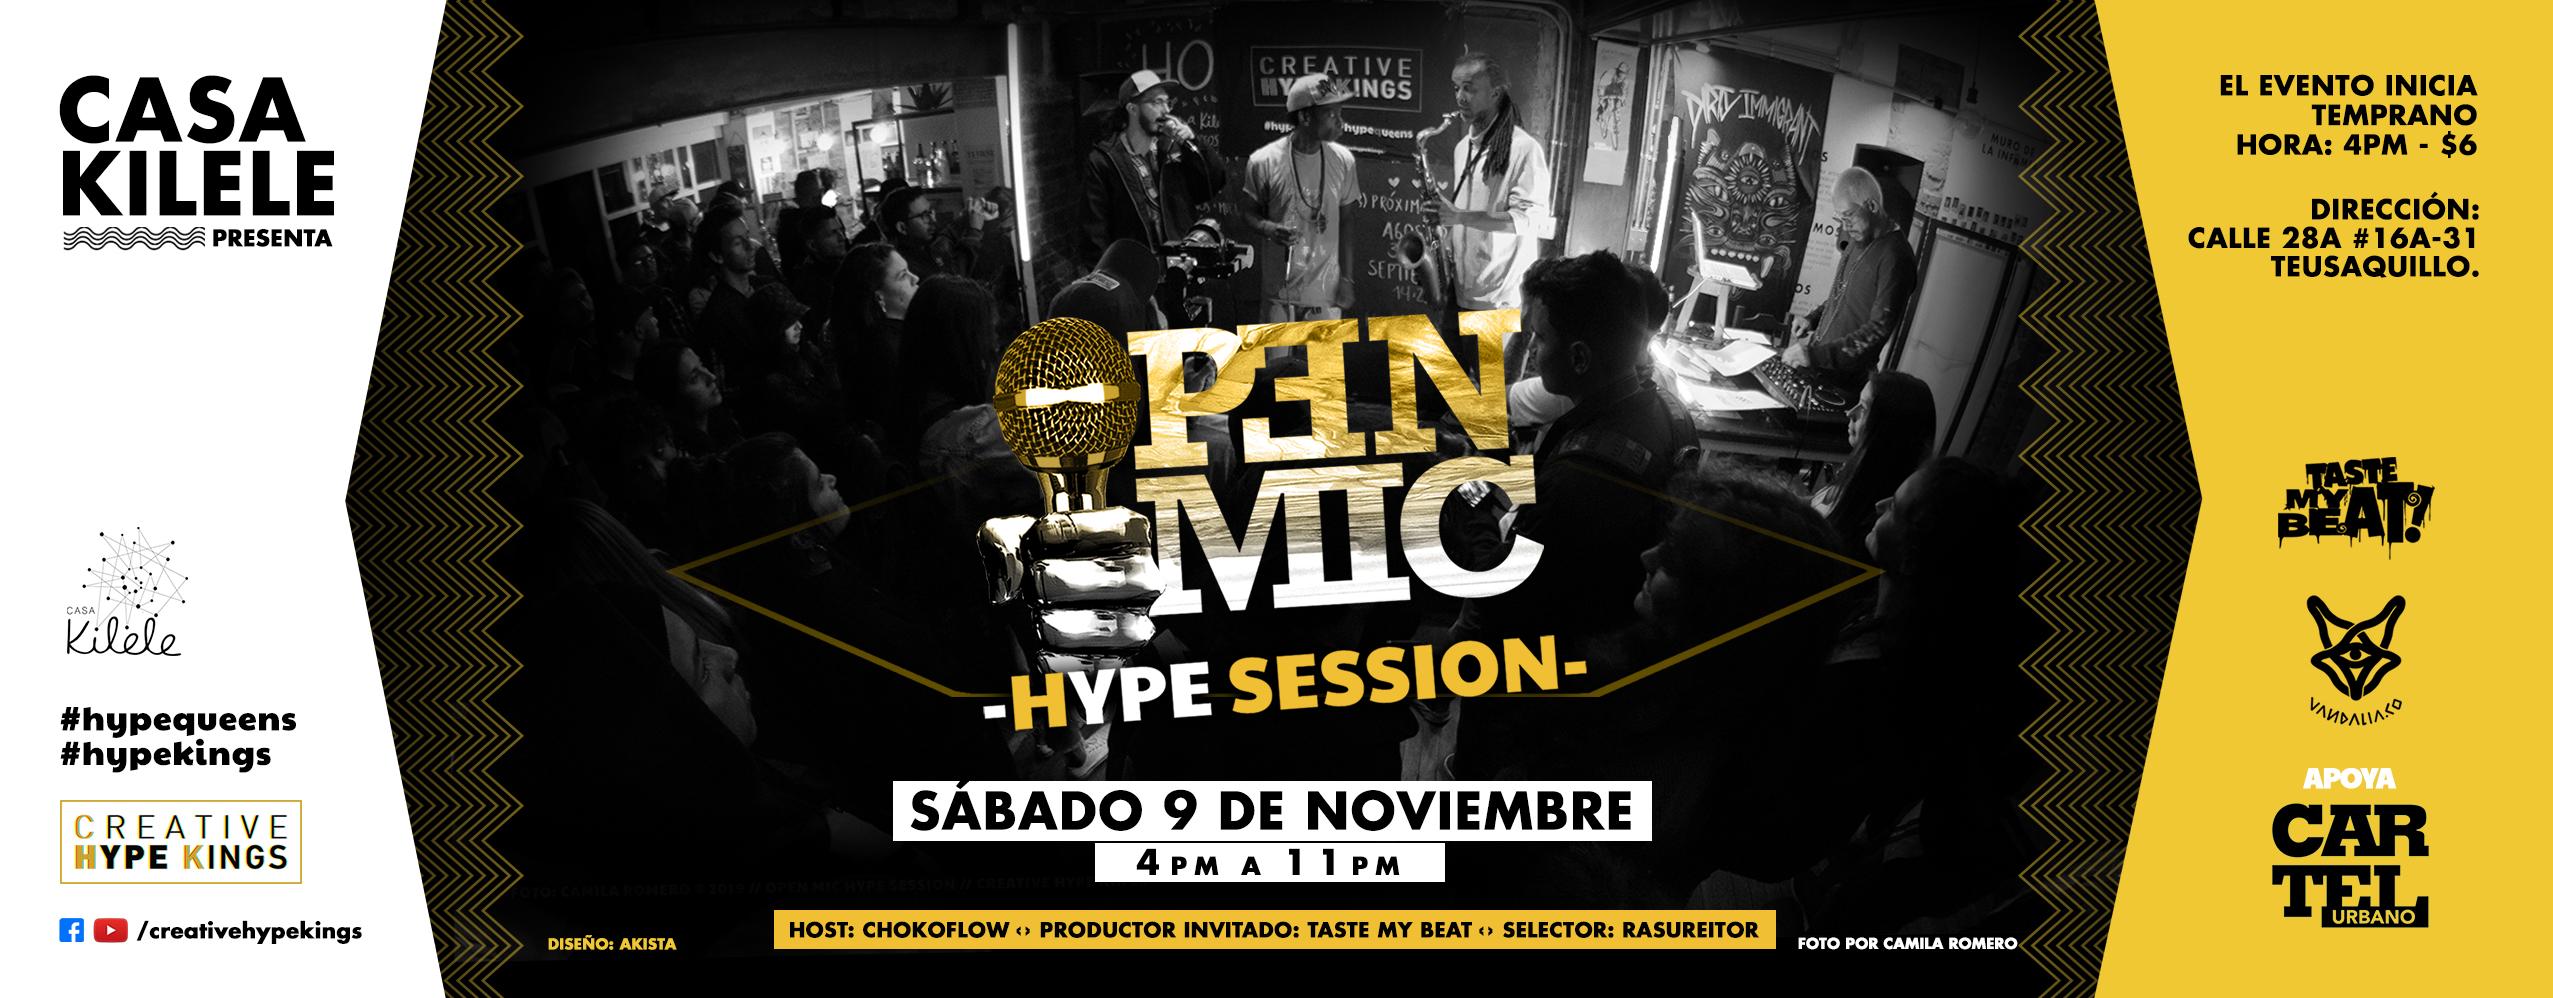 poster_hype_session_5_cartel_urbano.jpg